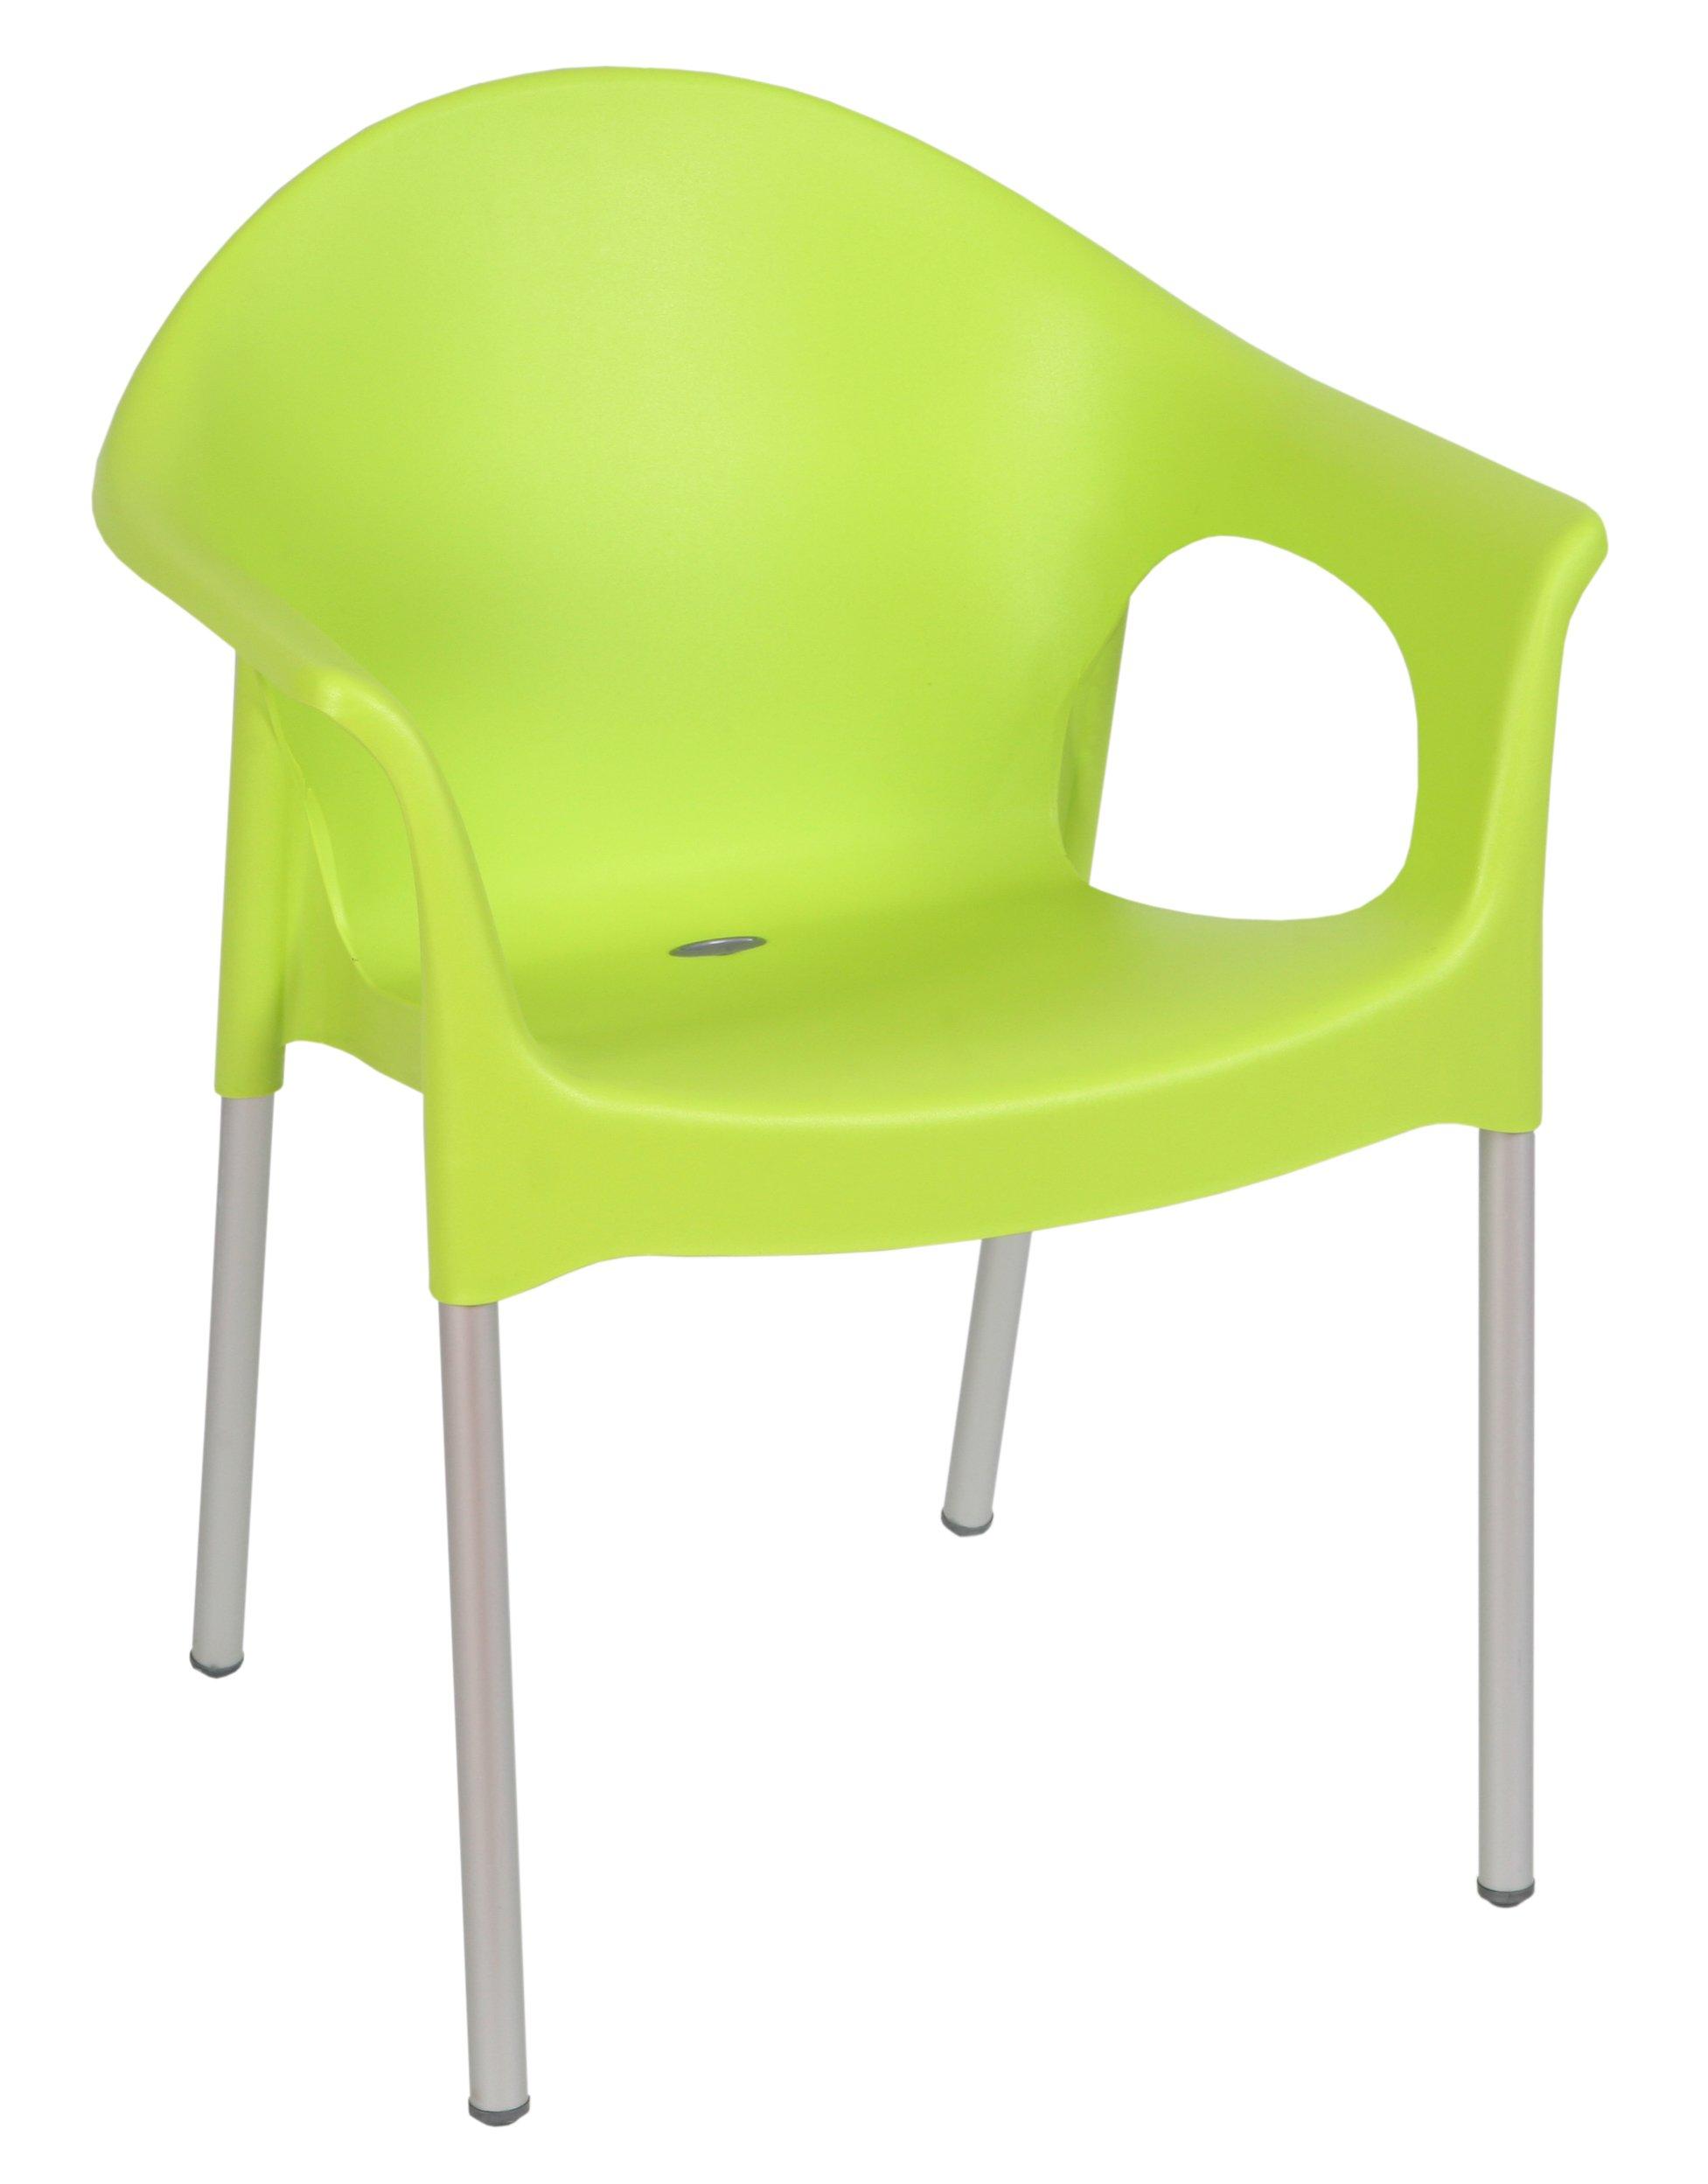 Tensai Lisa Collection Rounded Back Durable Plastic Chair - Lemon